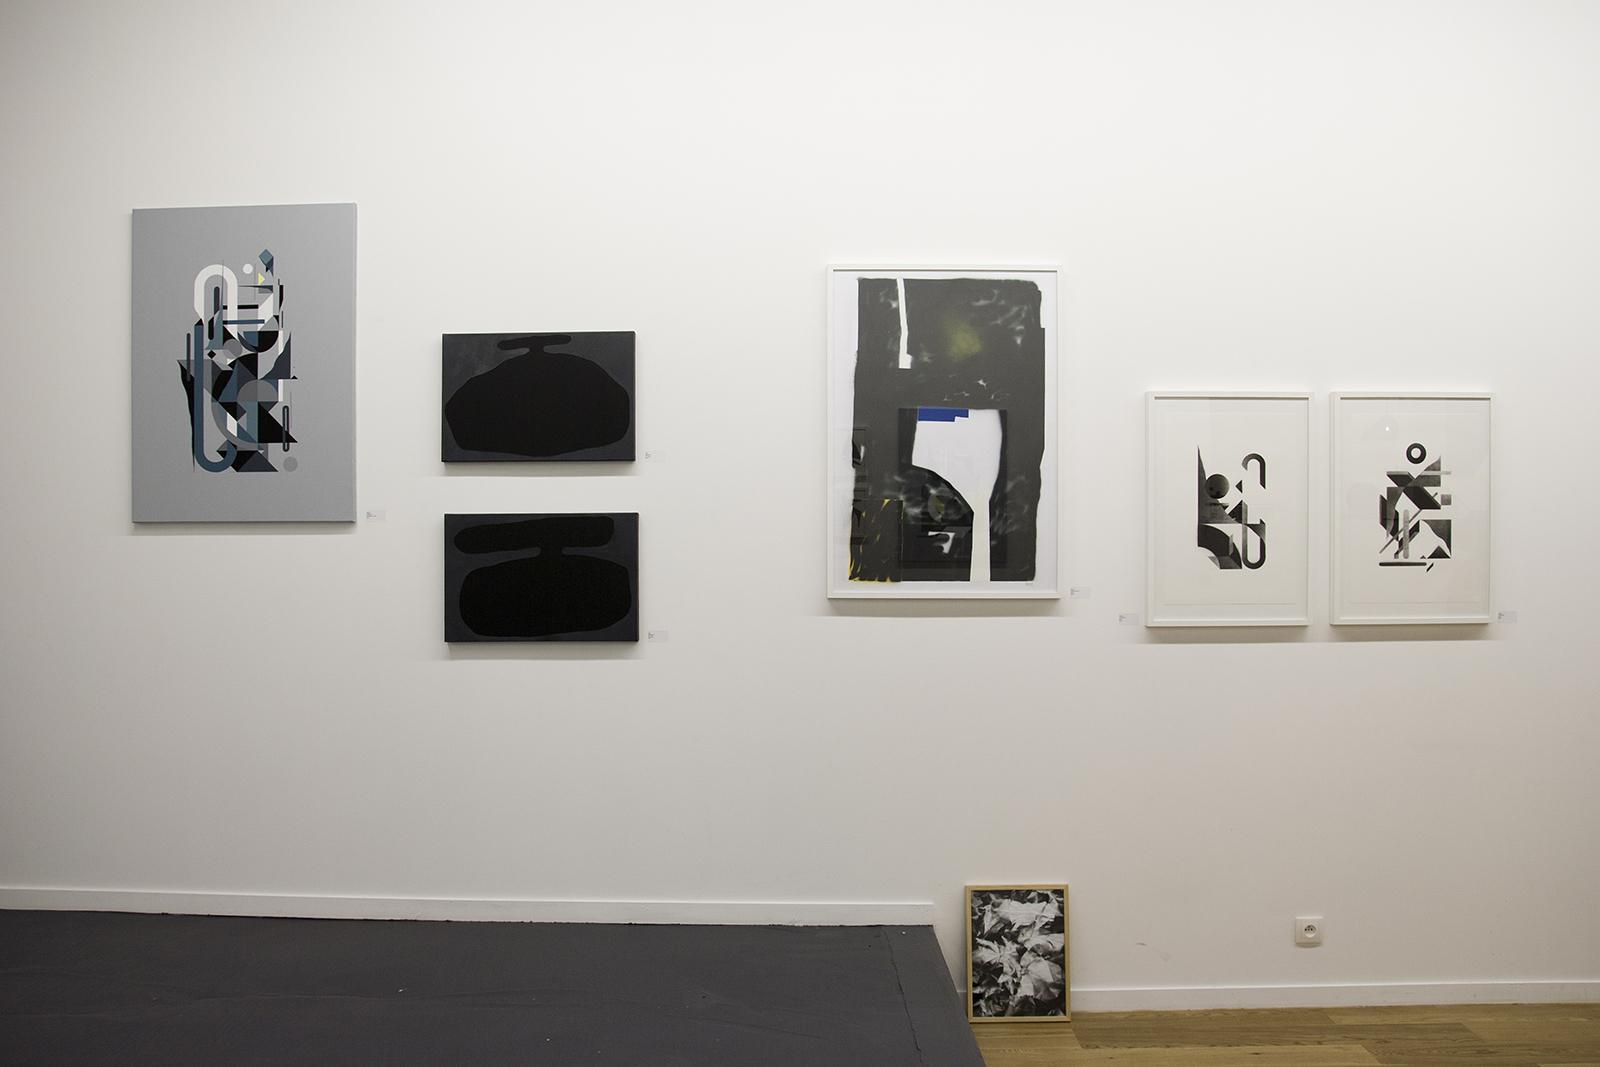 108-ekta-erosie-nelio-at-galerie-slika-recap-08